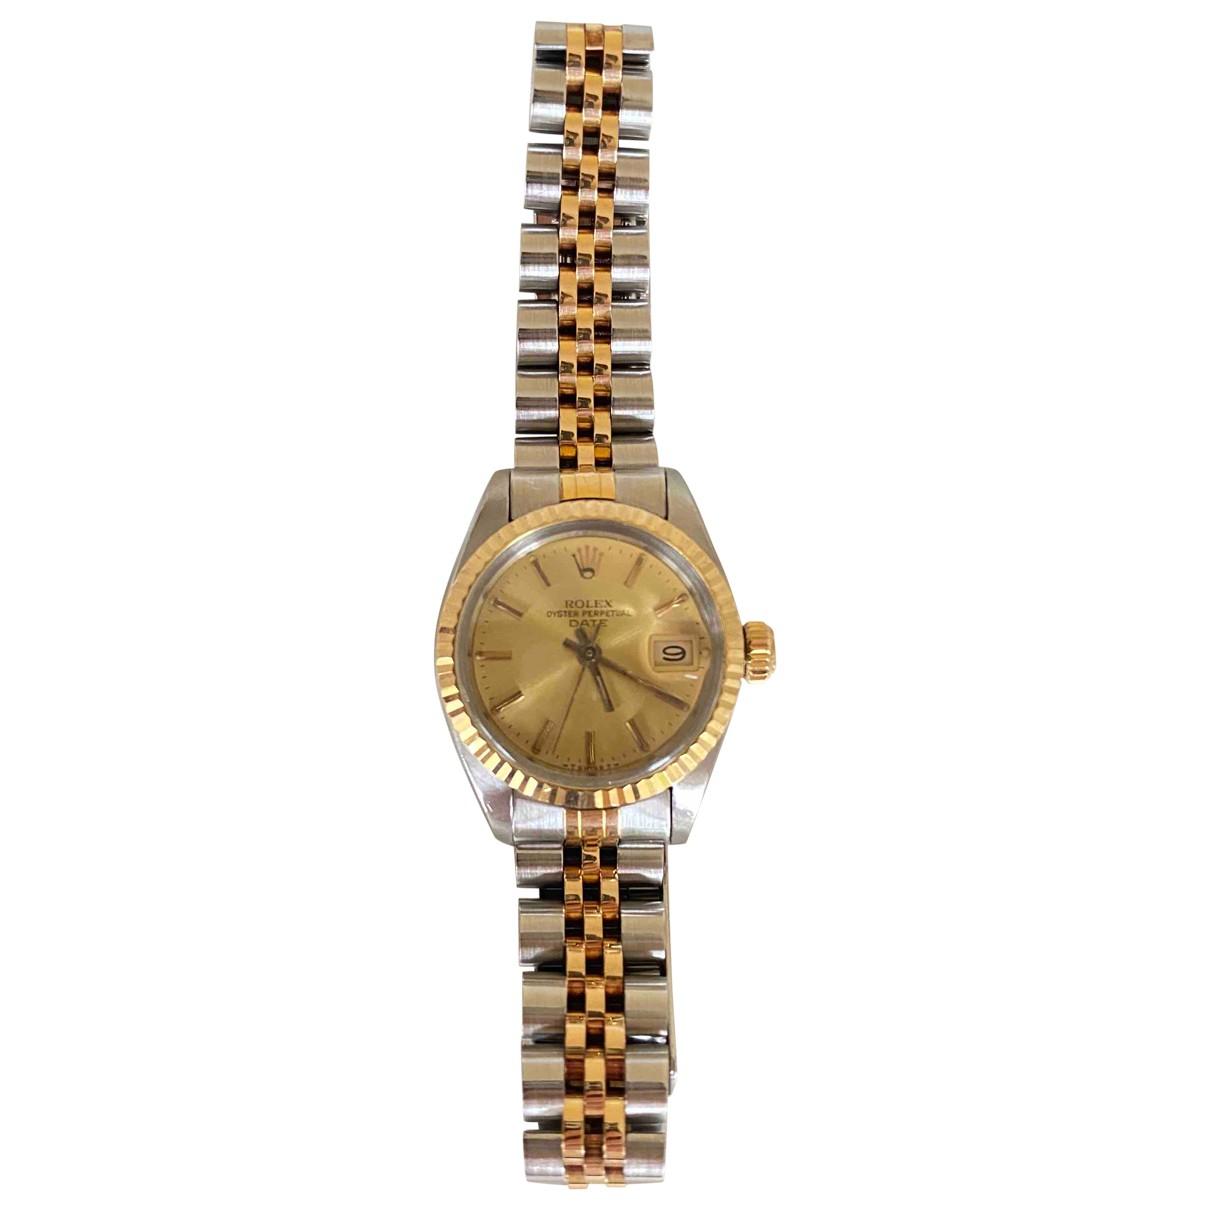 Reloj Lady Oyster Perpetual 26mm Rolex